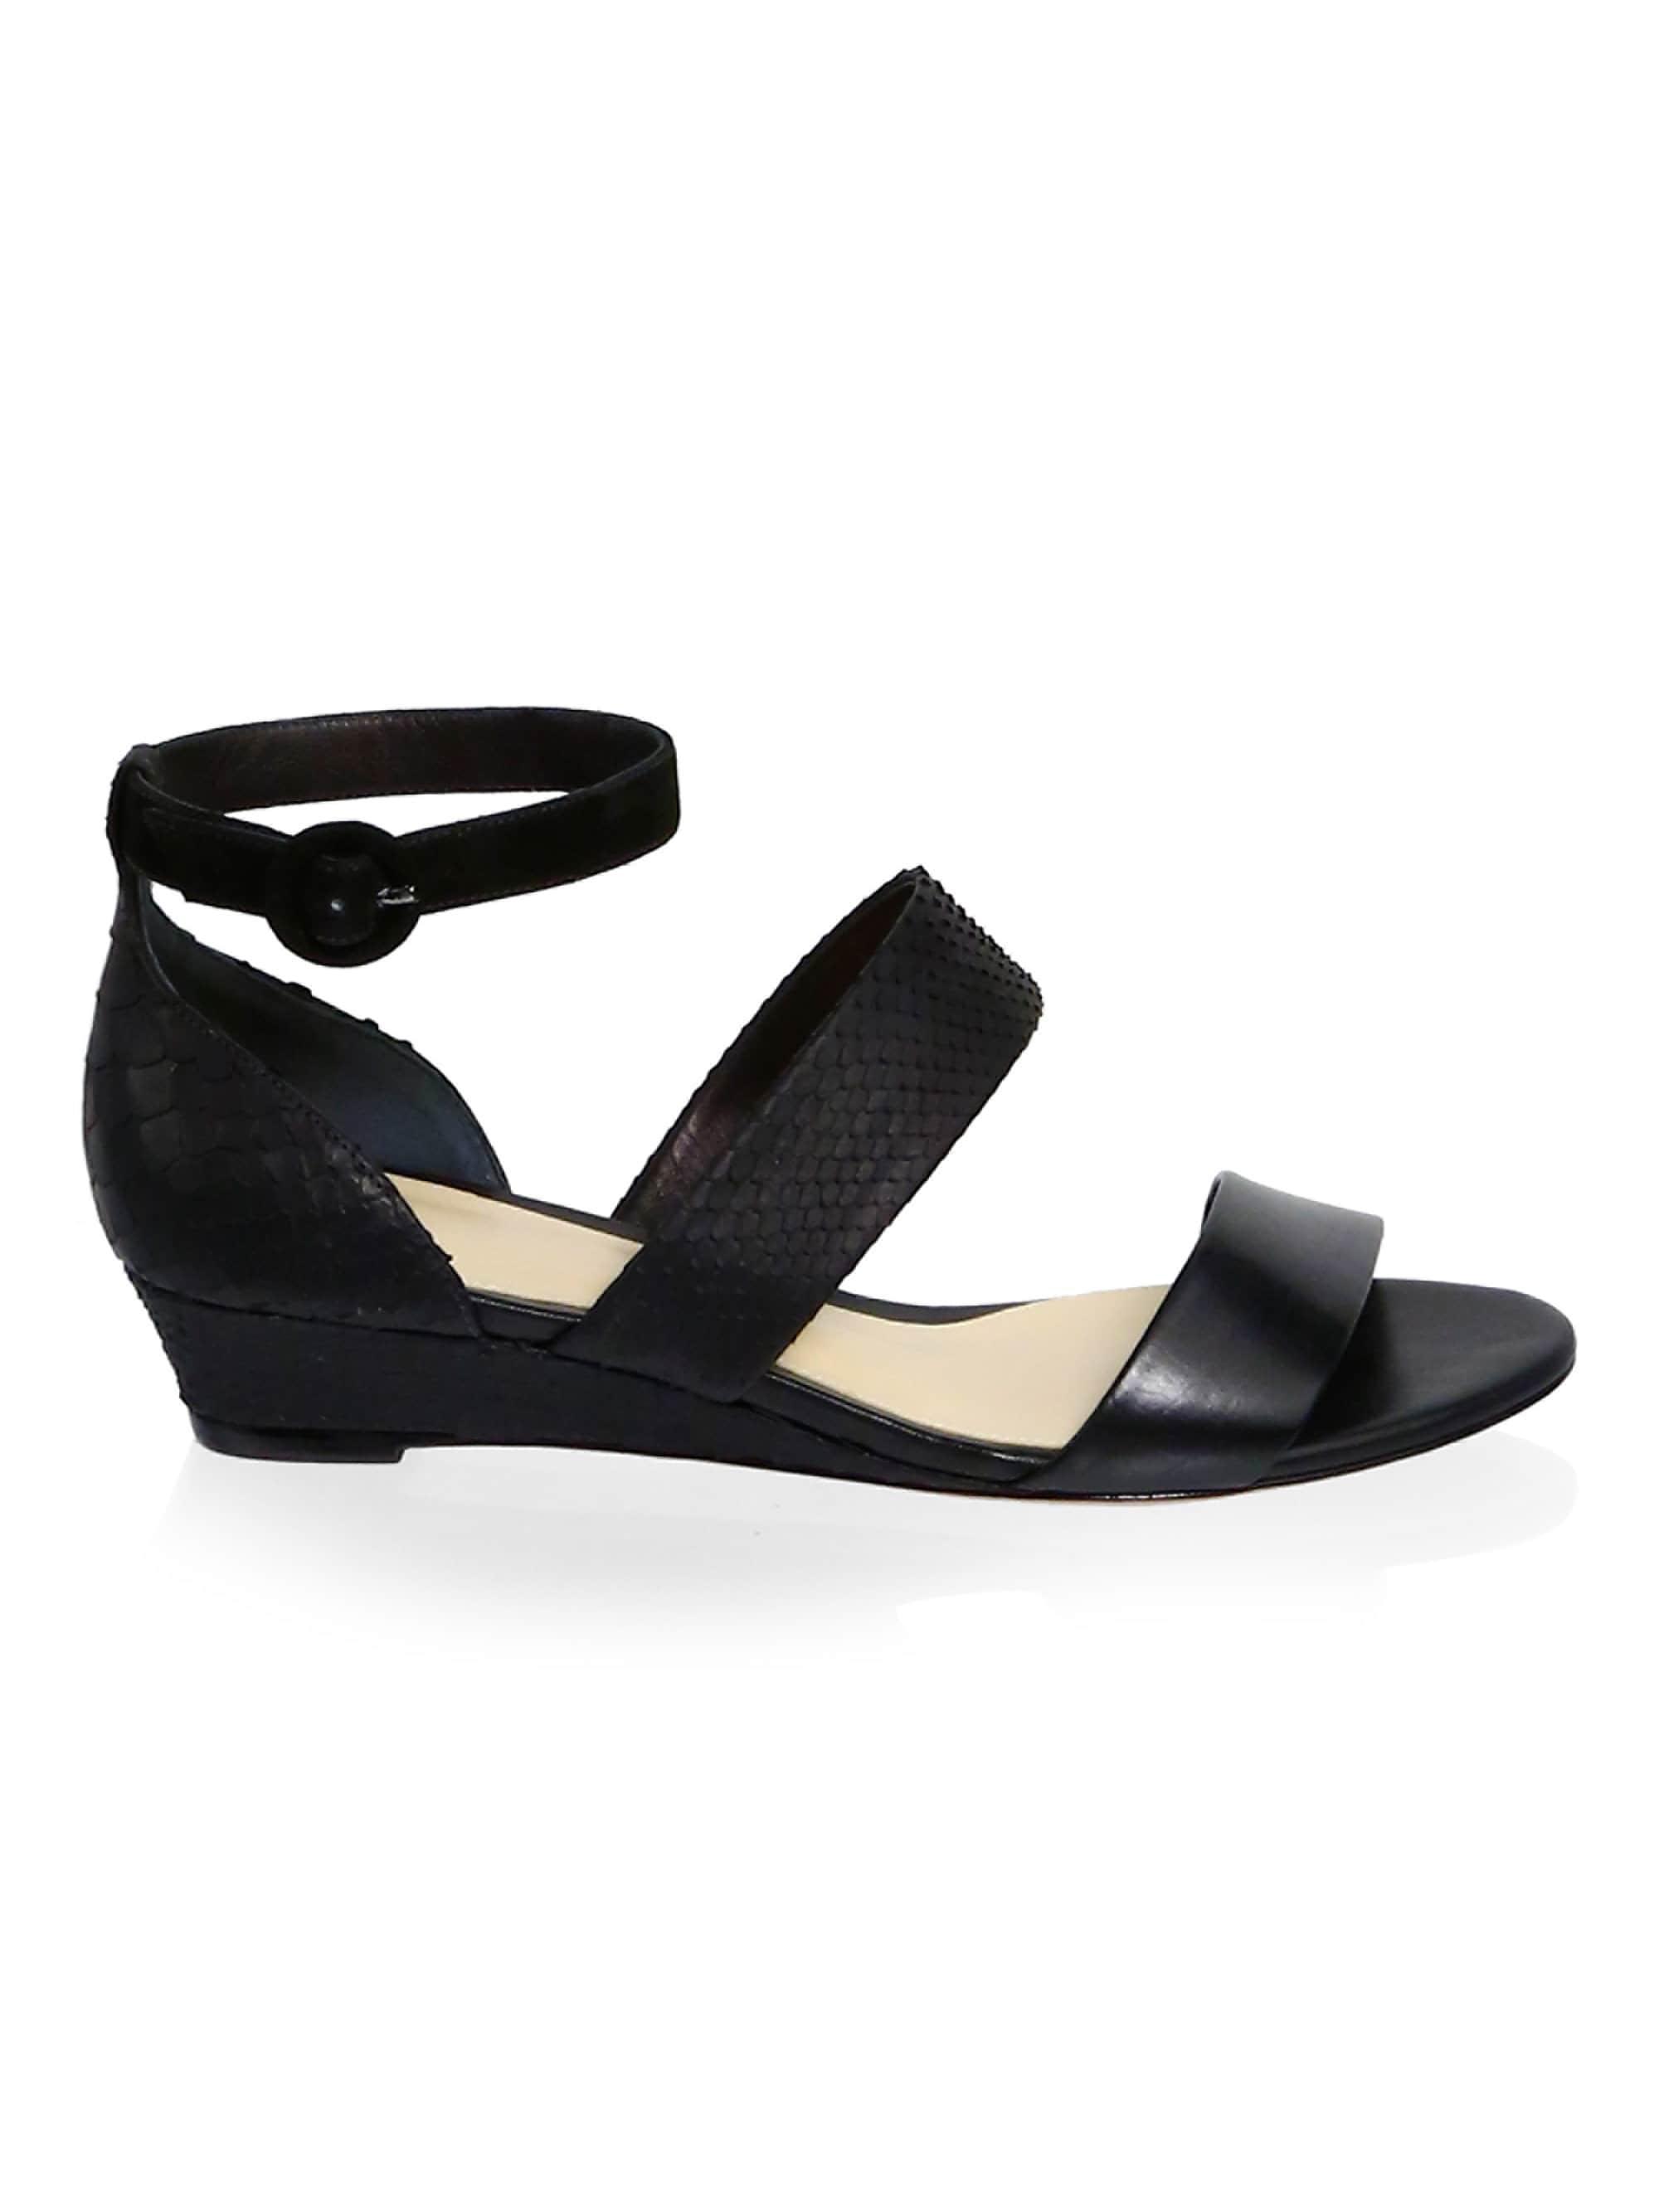 f1ef8f42452 Lyst - Alexandre Birman New Yanna Python   Leather Platform Sandals ...